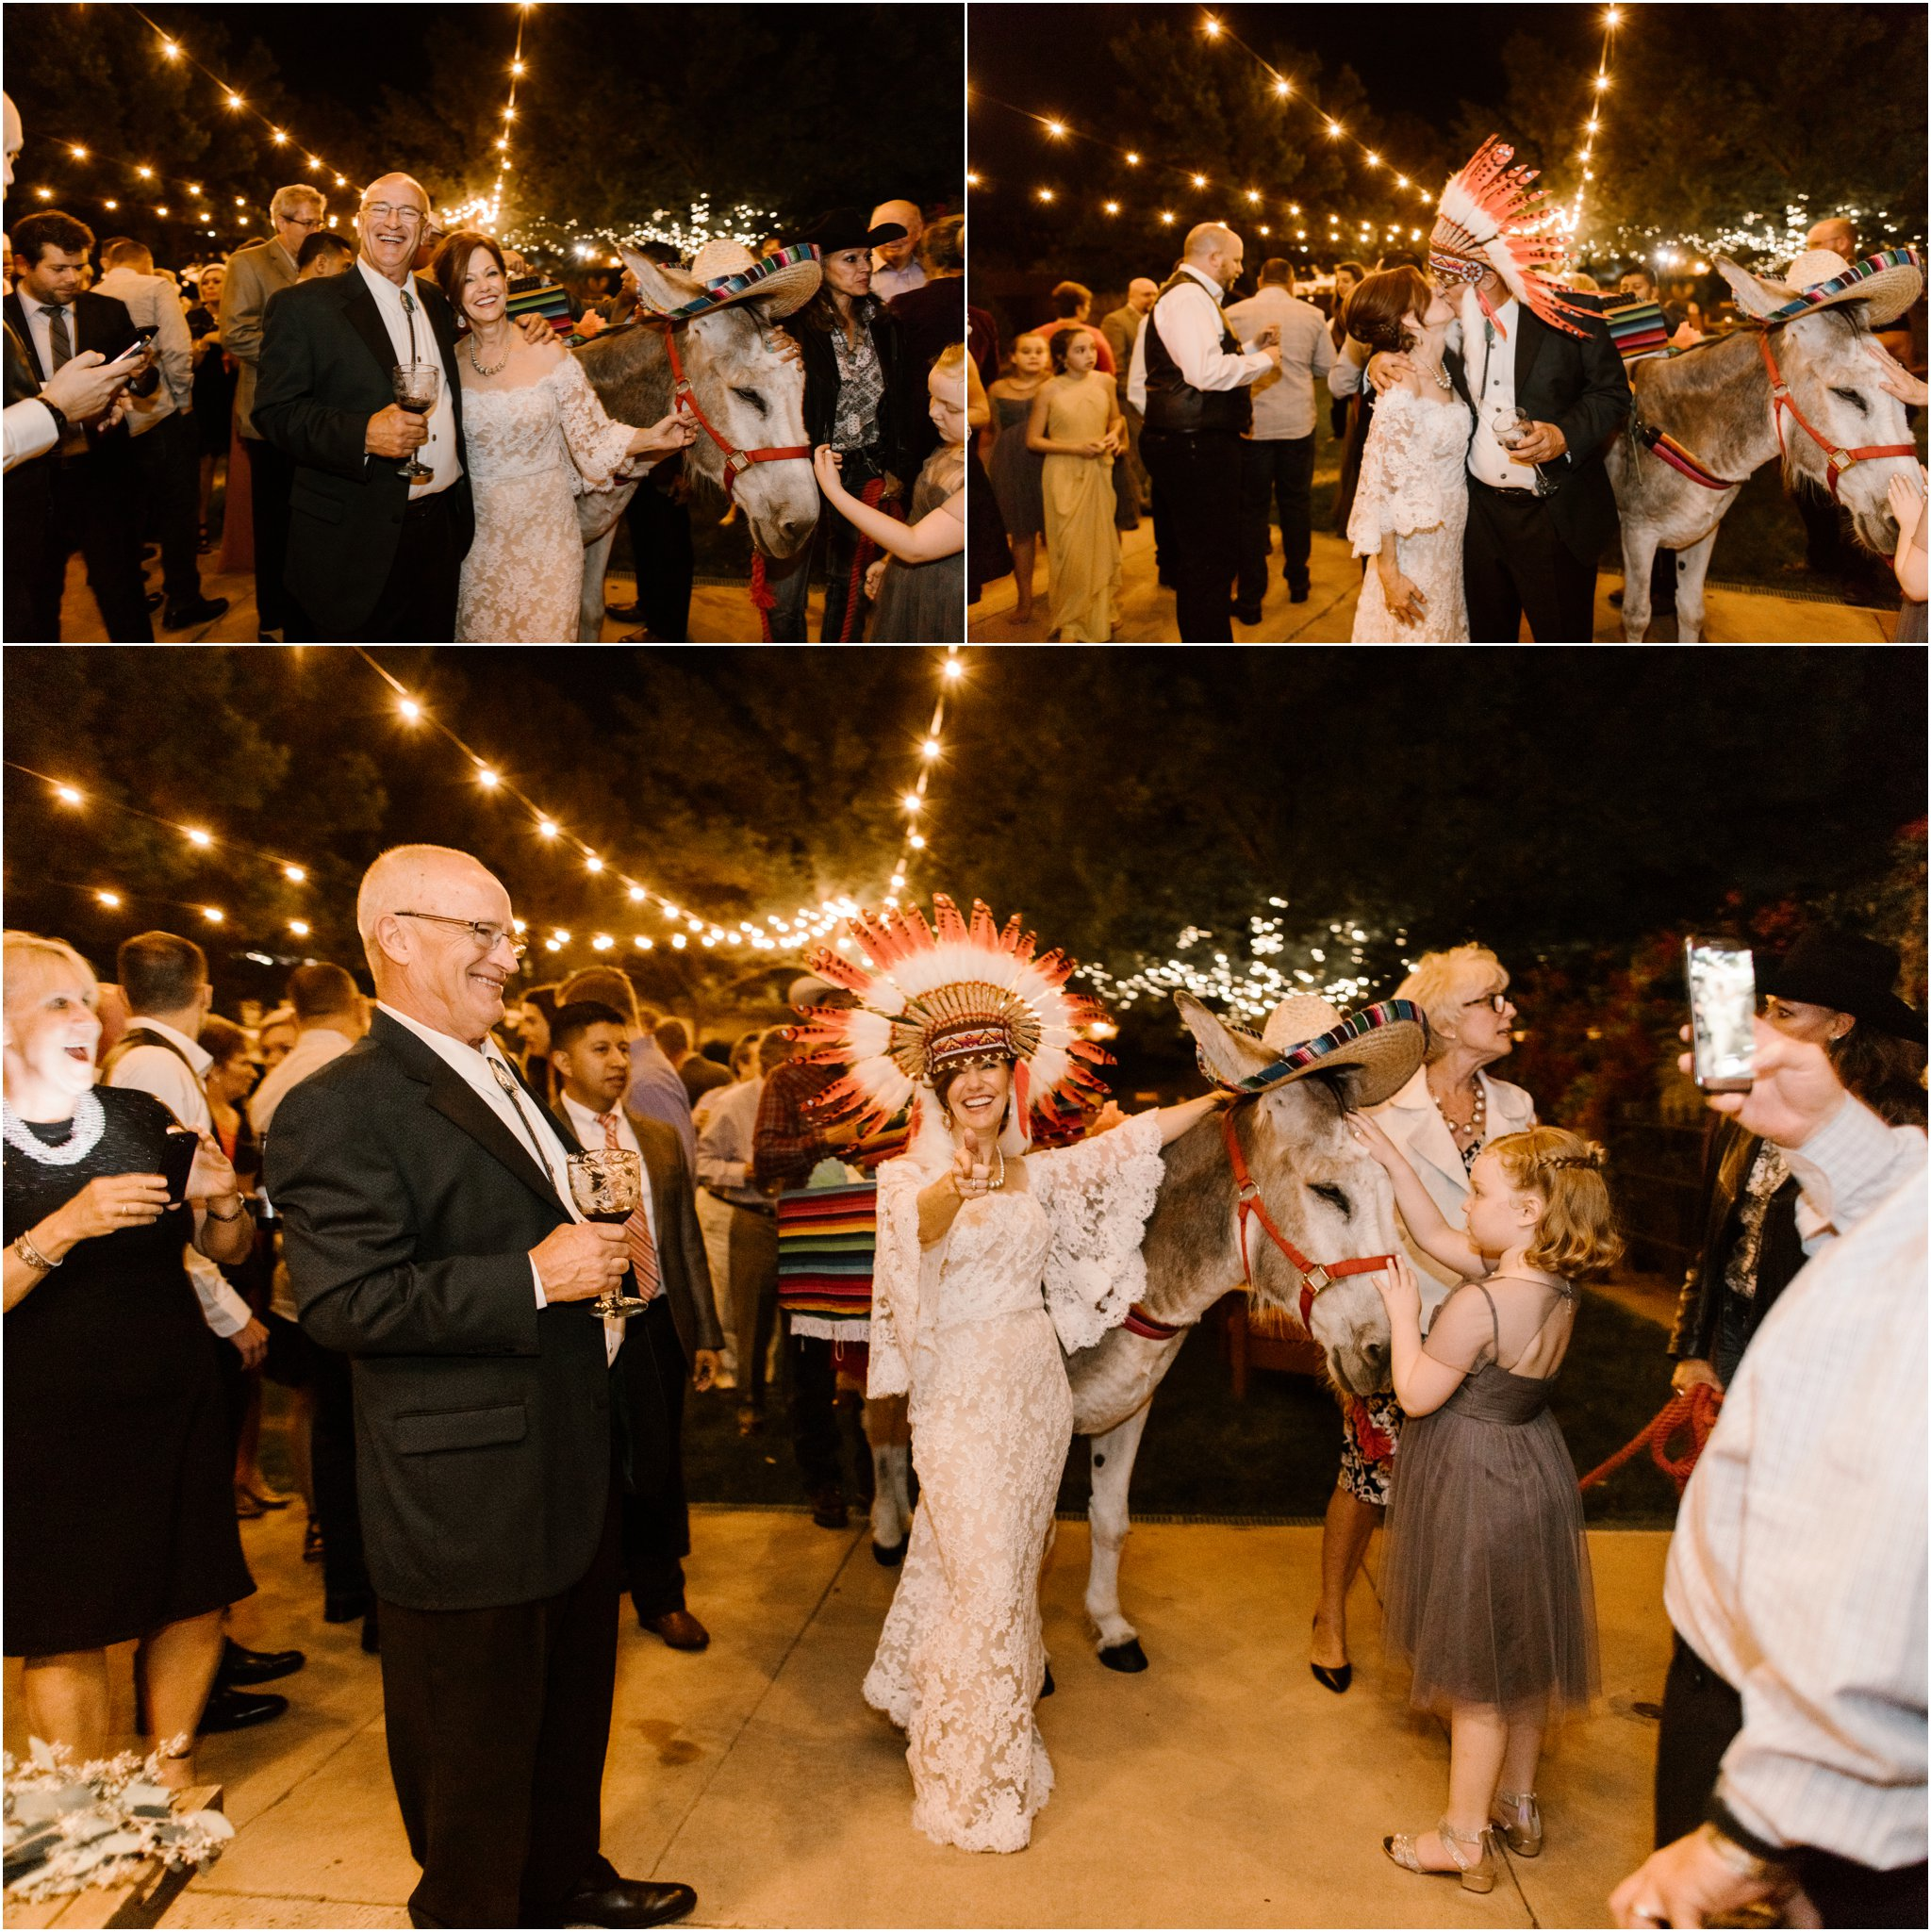 0060Santa Fe Wedding _Inn and Spa at Loretto Wedding, Inn and Spa at Loretto wedding, Santa Fe wedding photographers, blue rose photography